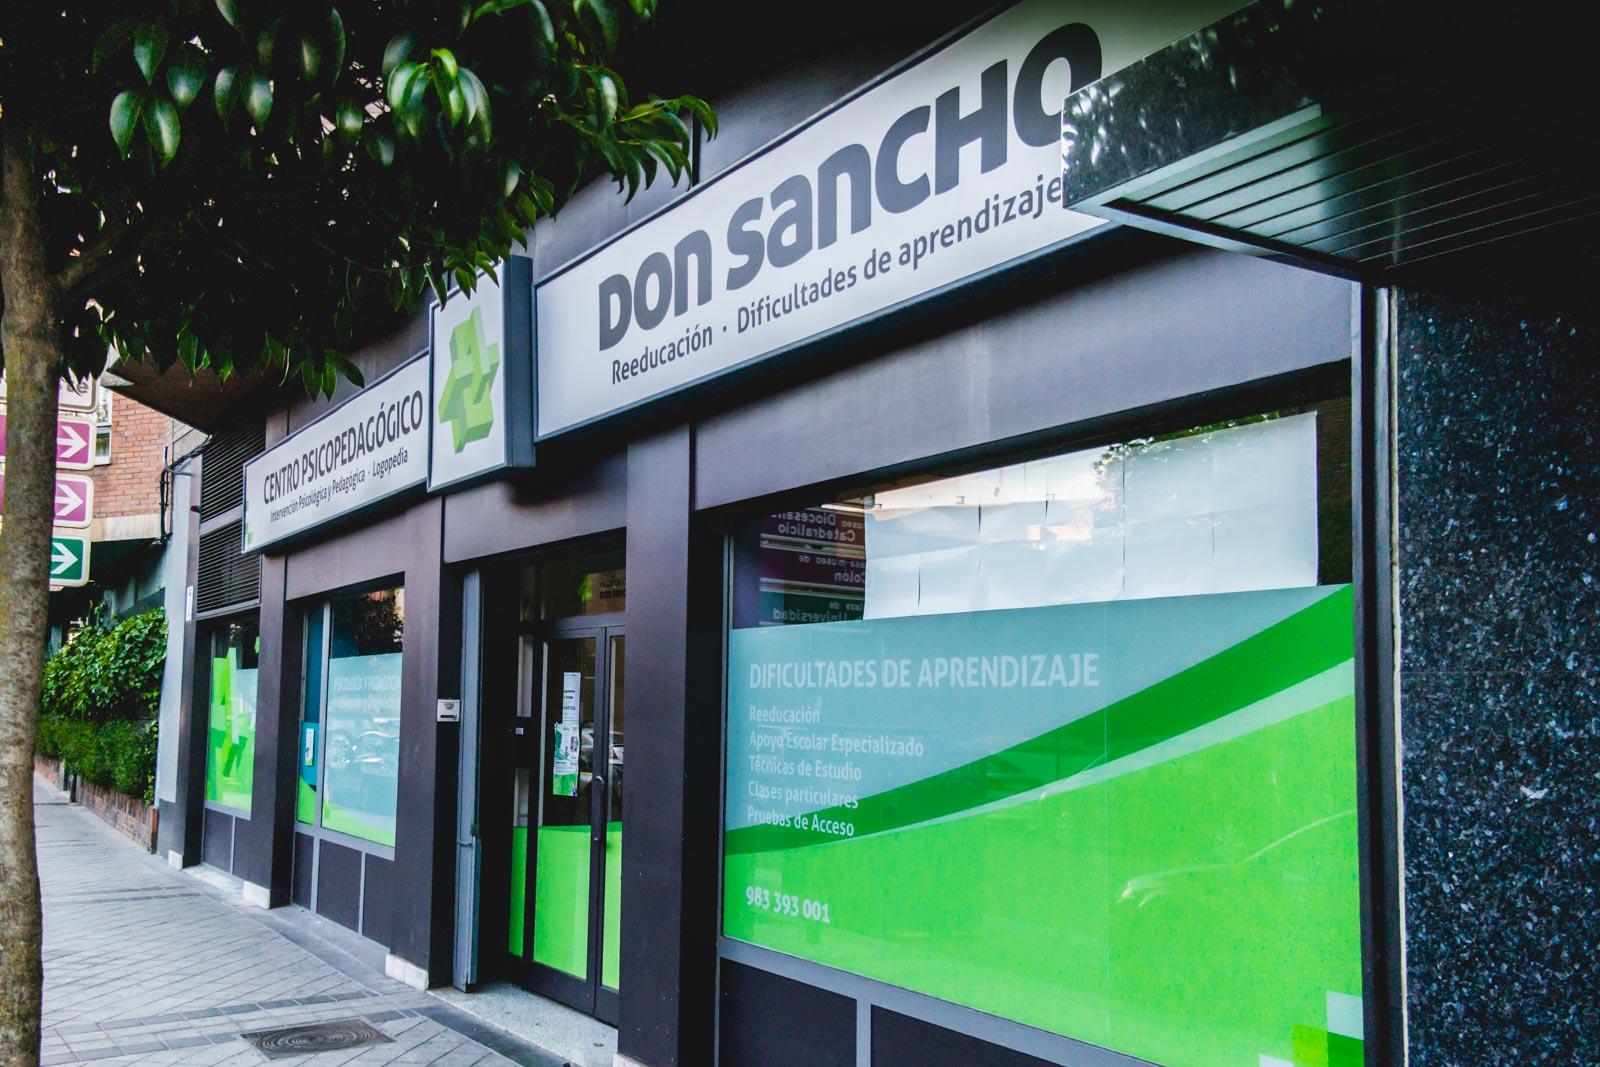 DonSancho_001_LOW_3